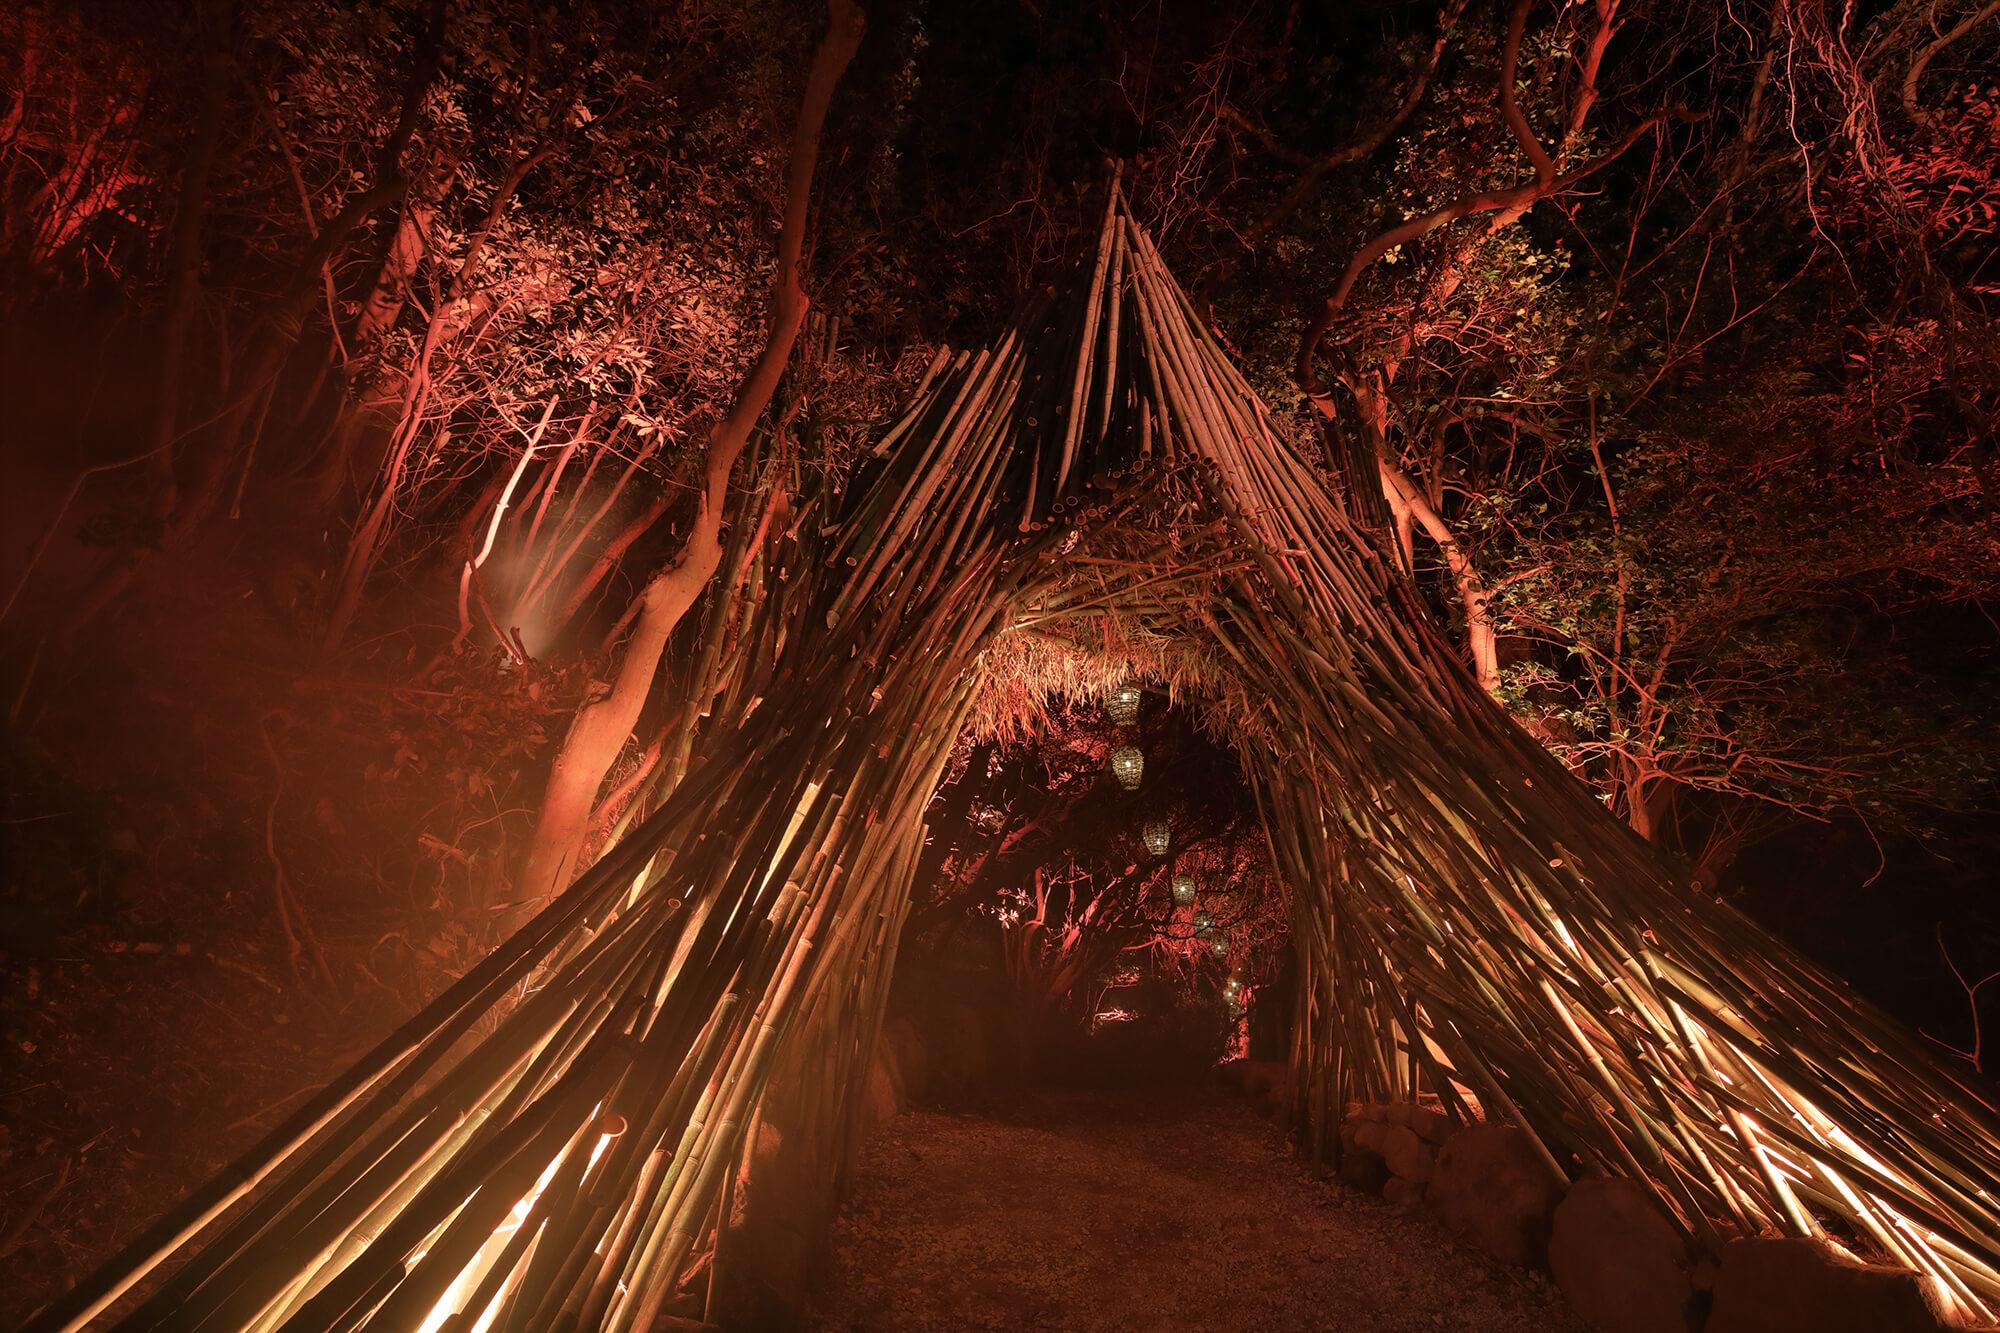 『ISLAND LUMINA 自然を舞台にしたマルチメディア・ナイトウォーク』-i+Land nagasaki 長崎県・伊王島-建築写真・竣工写真・インテリア写真1